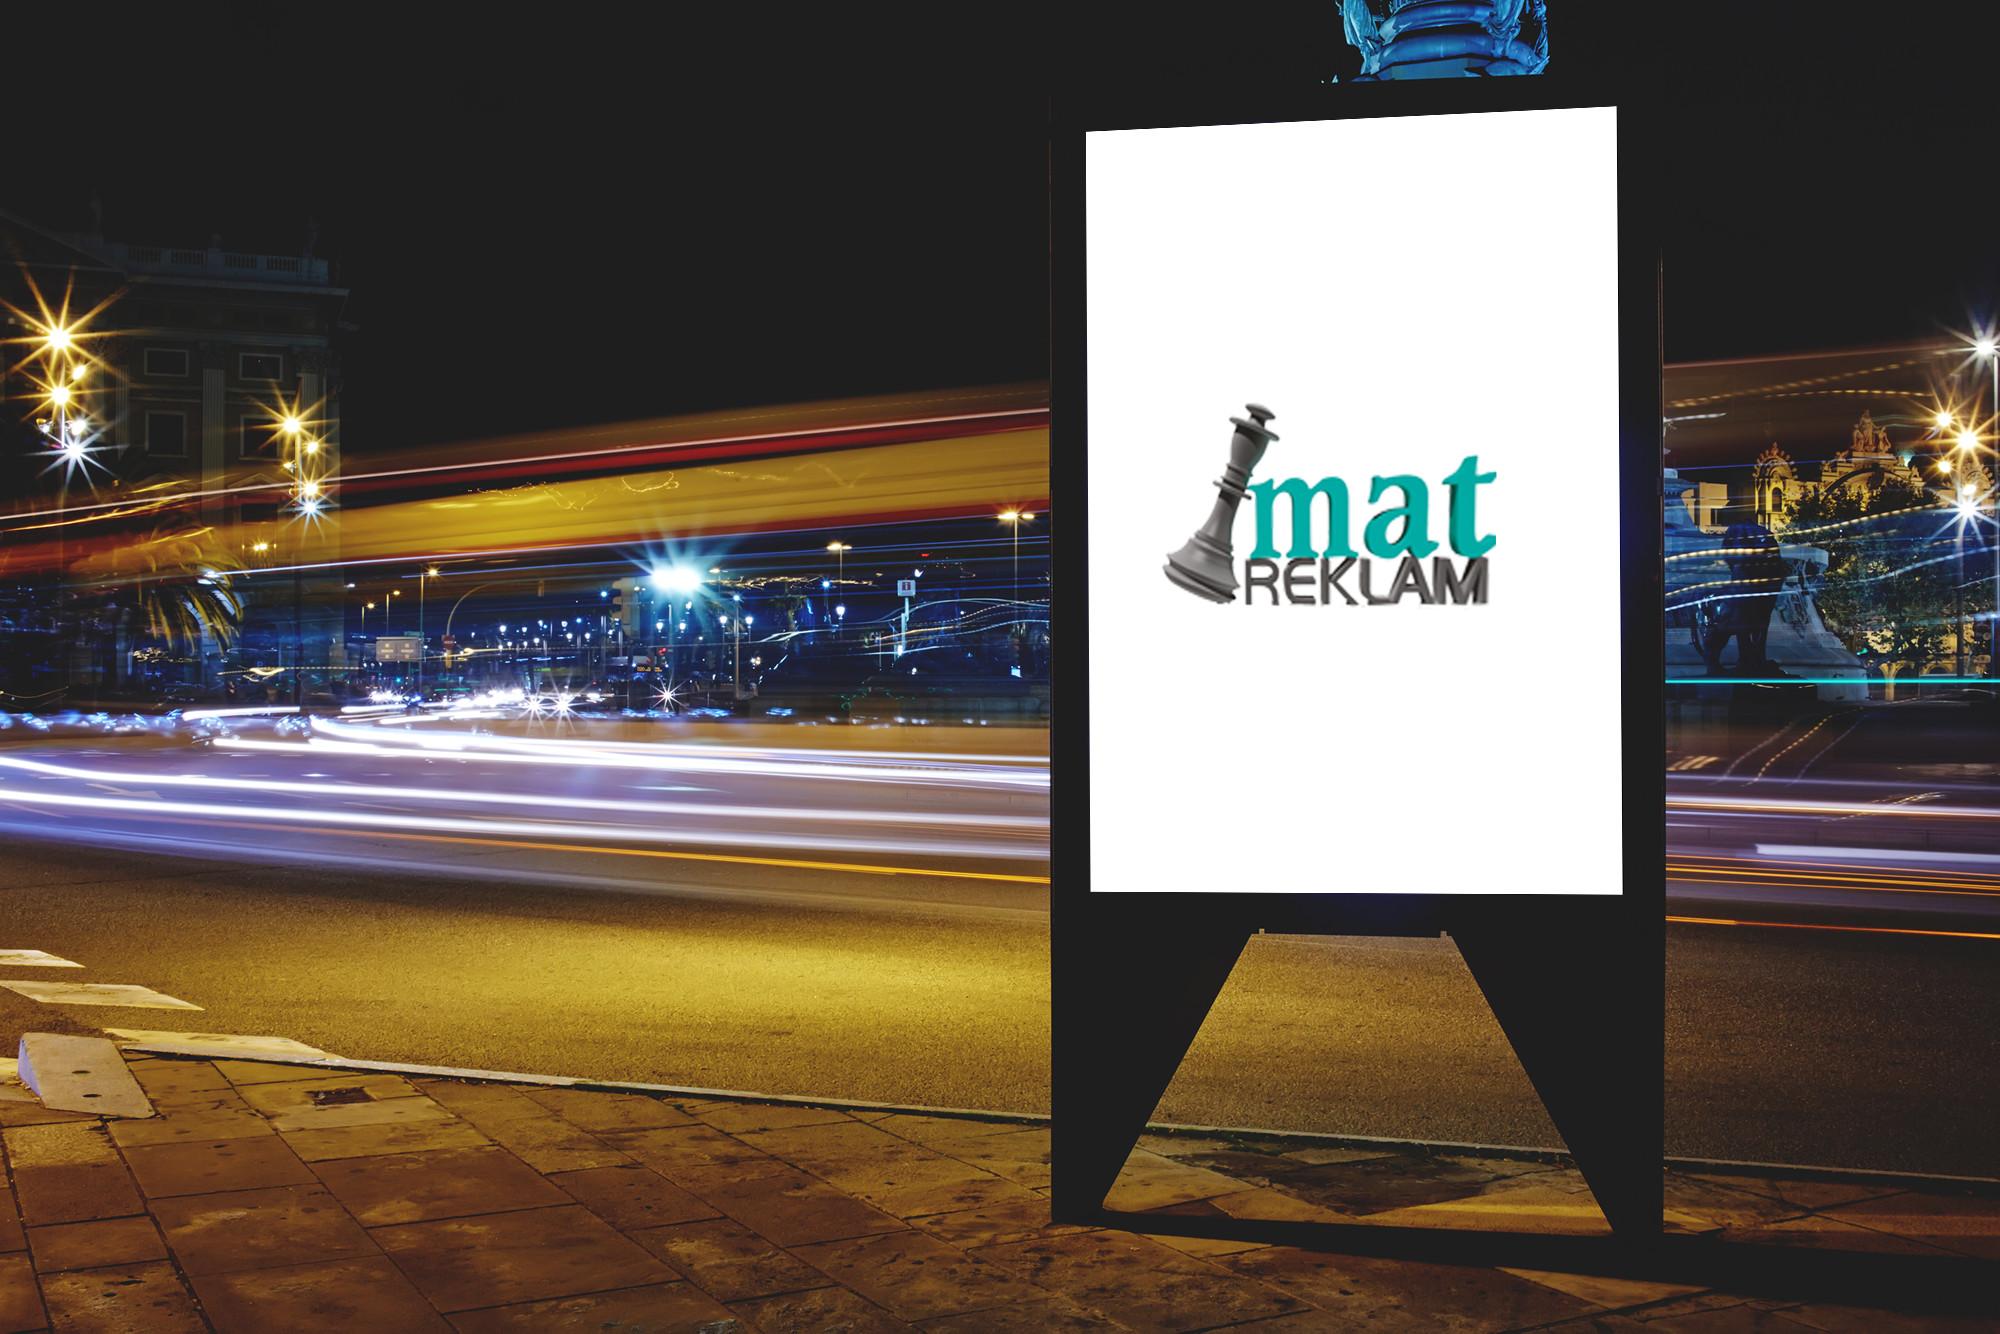 mat reklam yol billboard - branda - reklam - izmir bornova